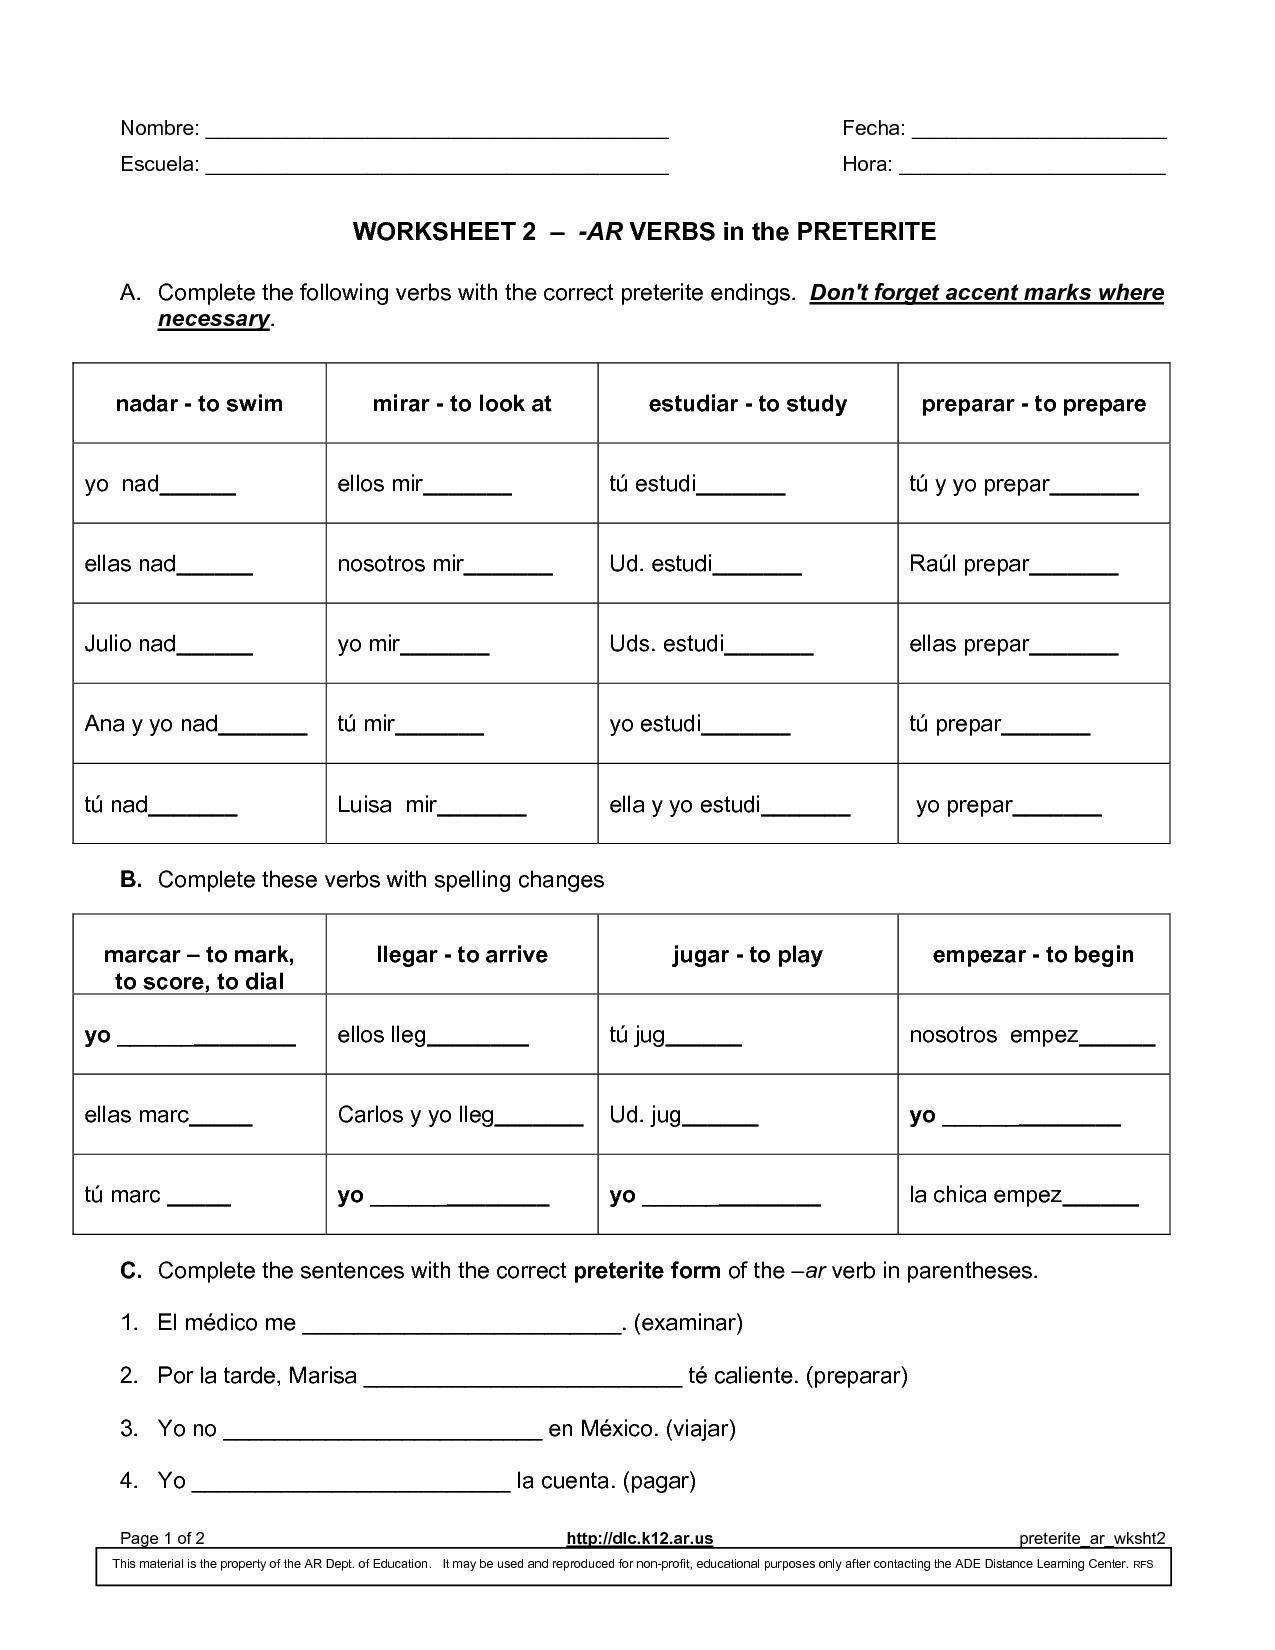 Worksheet Preterite Tense Answers Db Excel